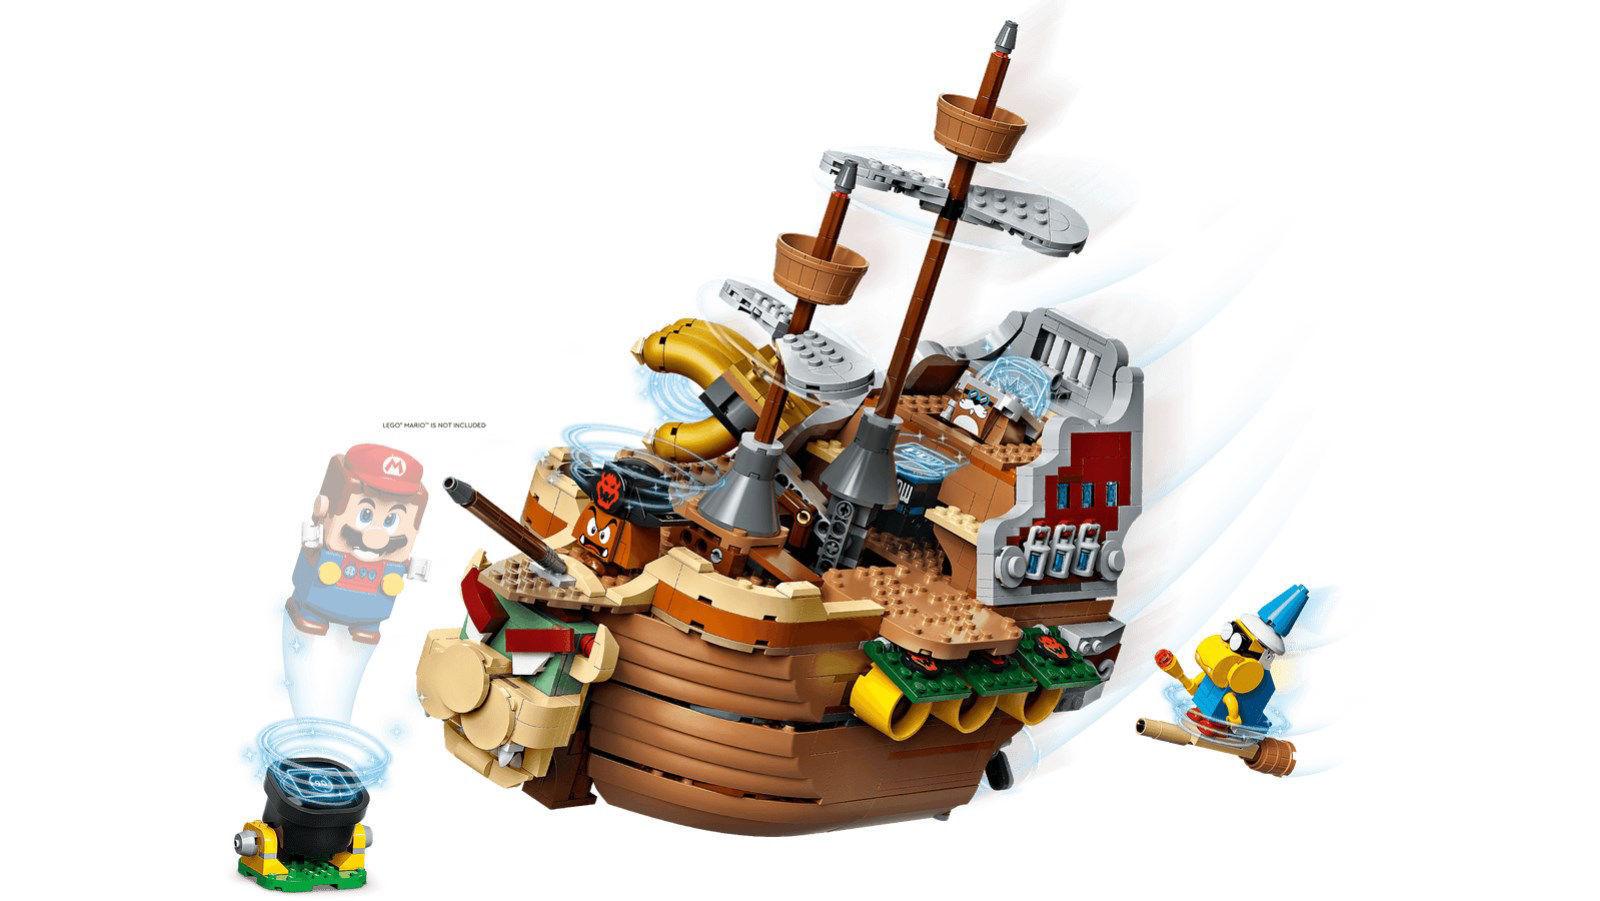 Lego Bowser's Airship Expansion Set